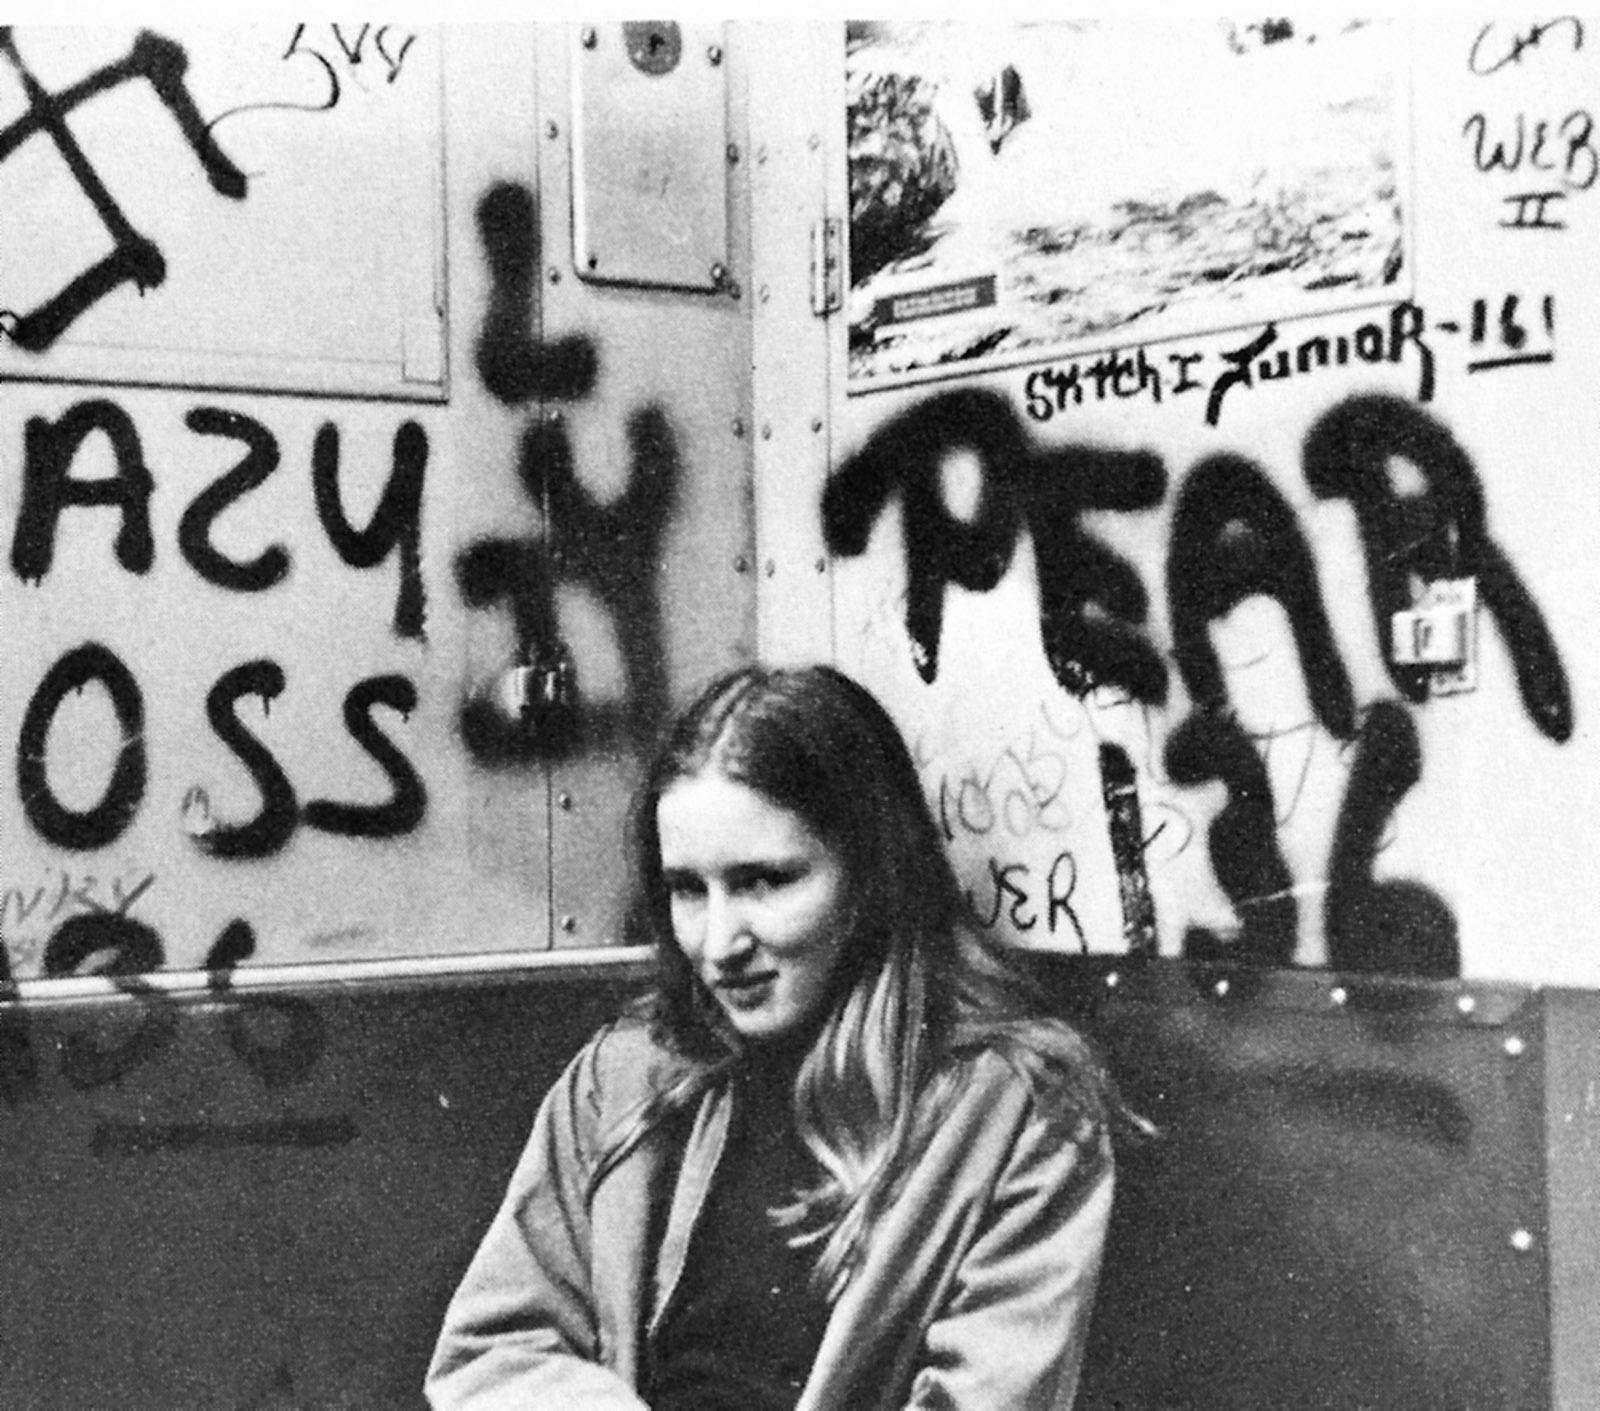 Rachel Cline on the subway as a teenager, Brooklyn, circa 1972